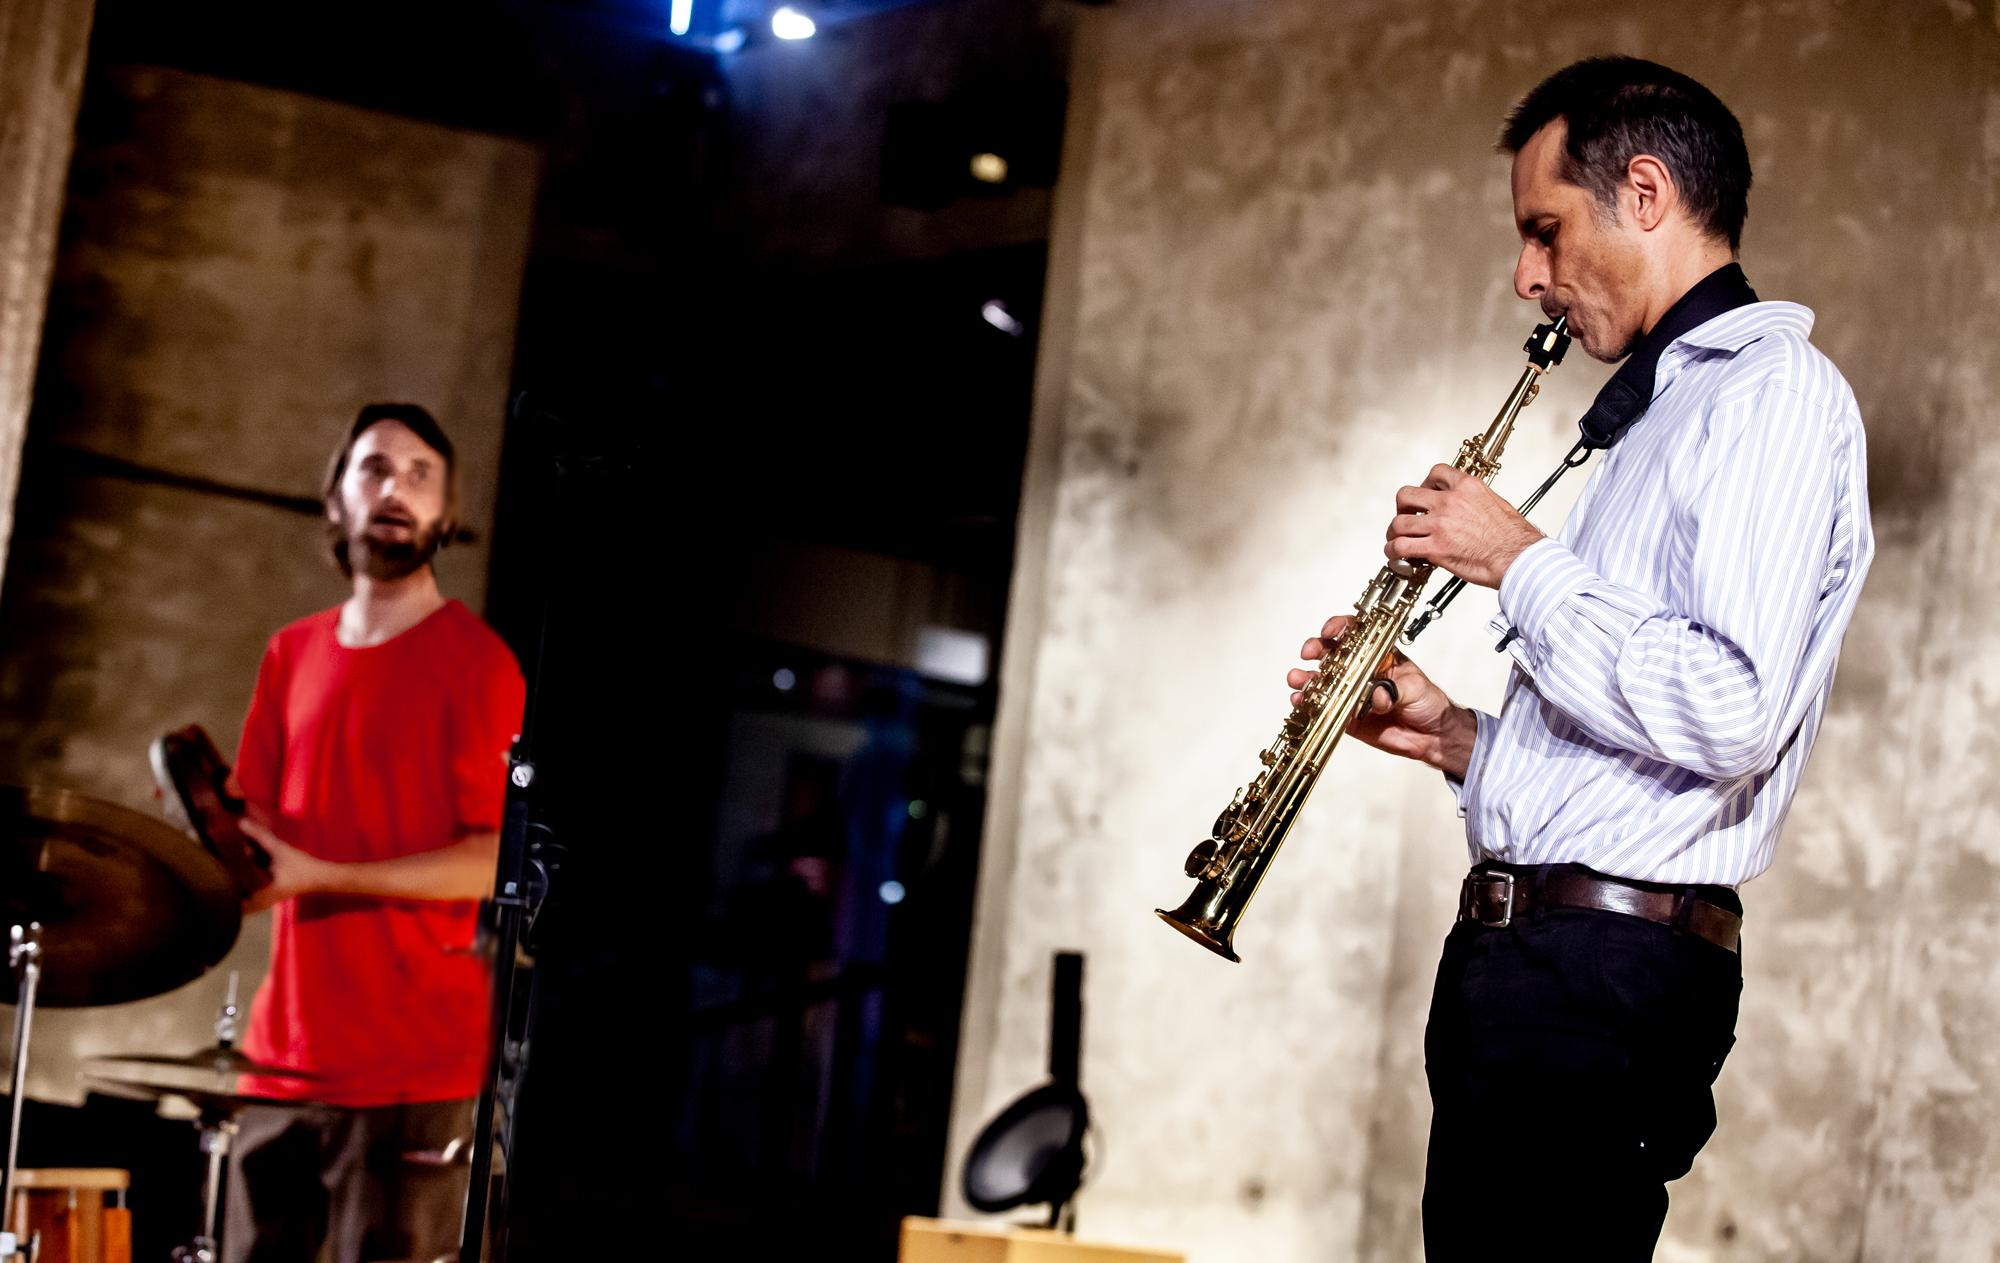 Stanley J. Zappa & Simo Laihonen (US/FI)